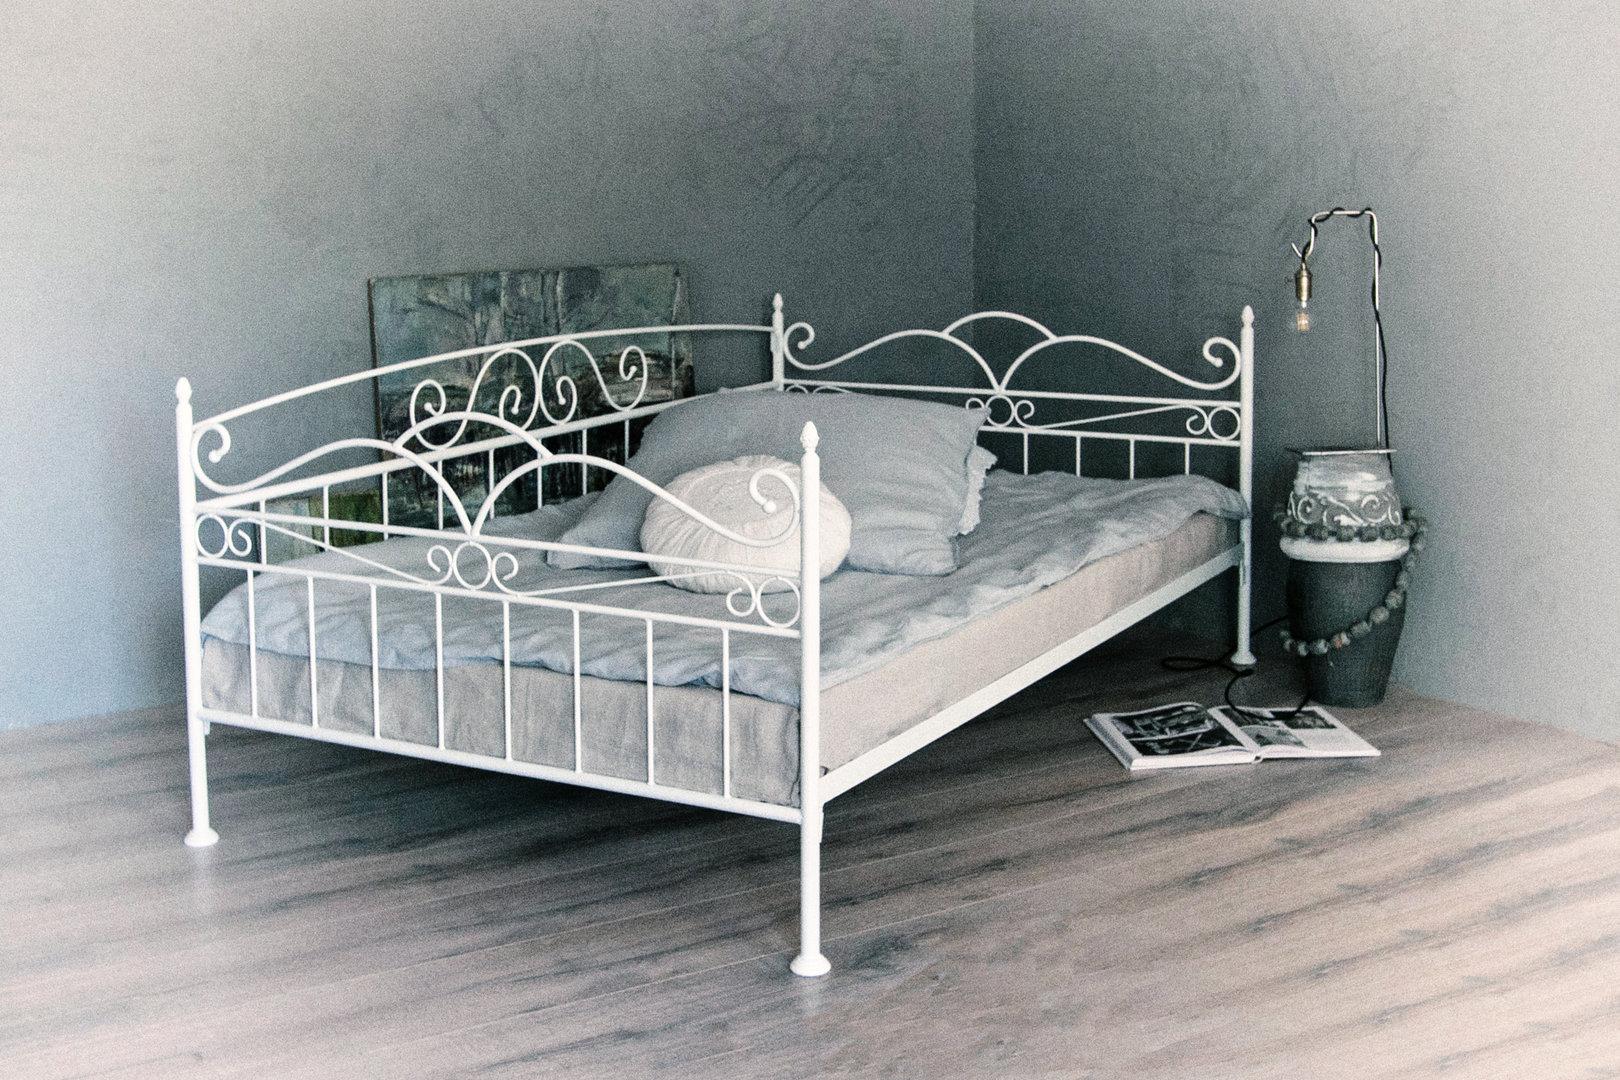 Full Size of Trend Sofa Bett 140x200 In Weiss Ecru Transparent Kupfer Badewanne Bette Joop Betten Barock Günstige 180x200 Rauch Niedrig 140 X 200 Mit Stauraum 160x200 Bett Bett Weiß 140x200